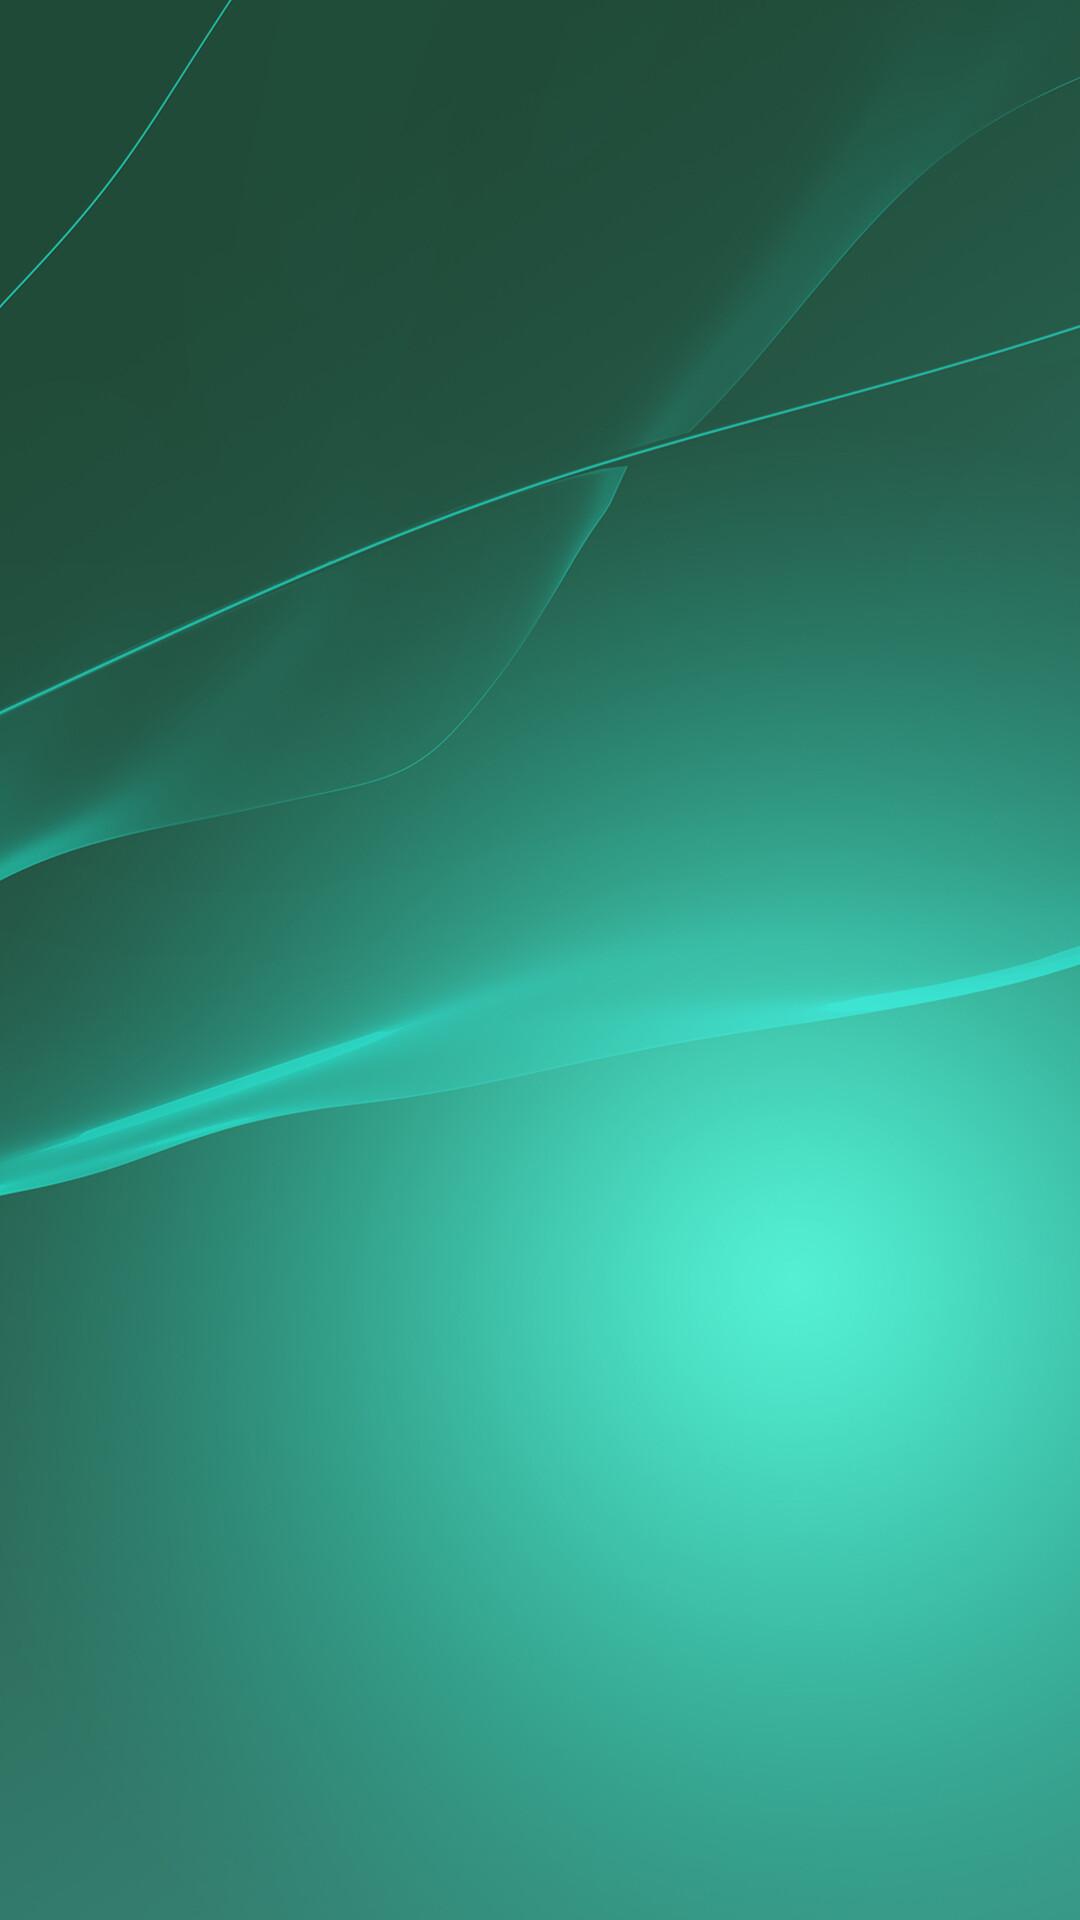 Xperia Z Green Wallpaper Hd